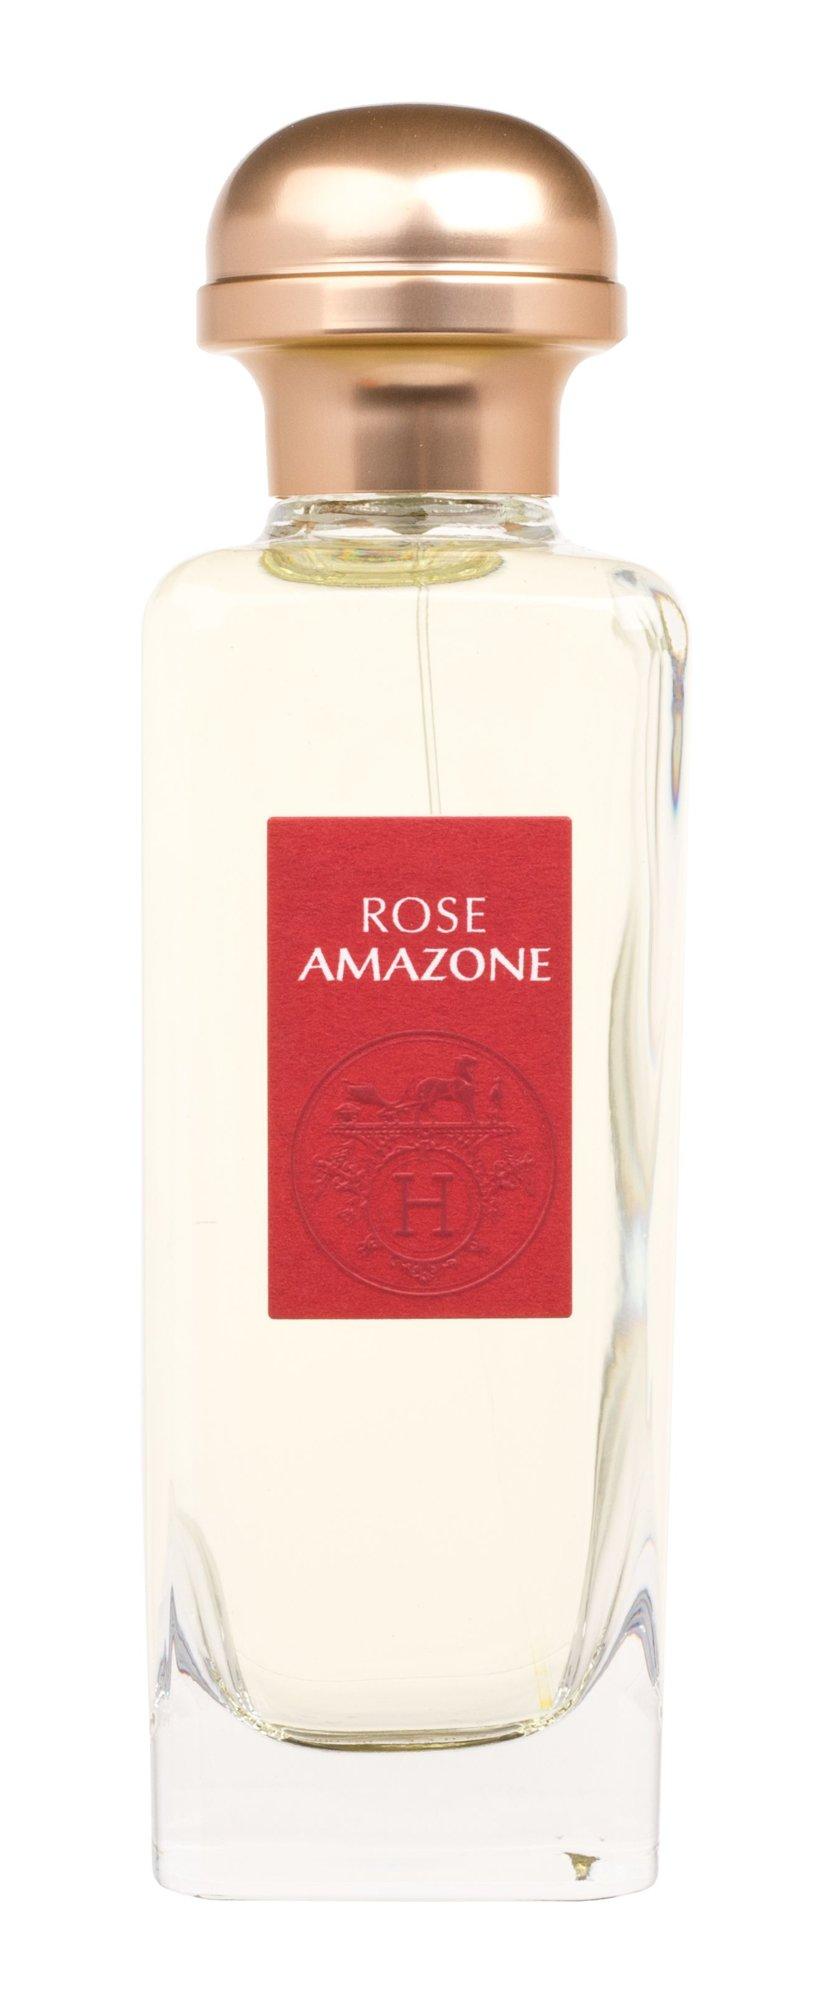 Hermes Rose Amazone EDT 100ml